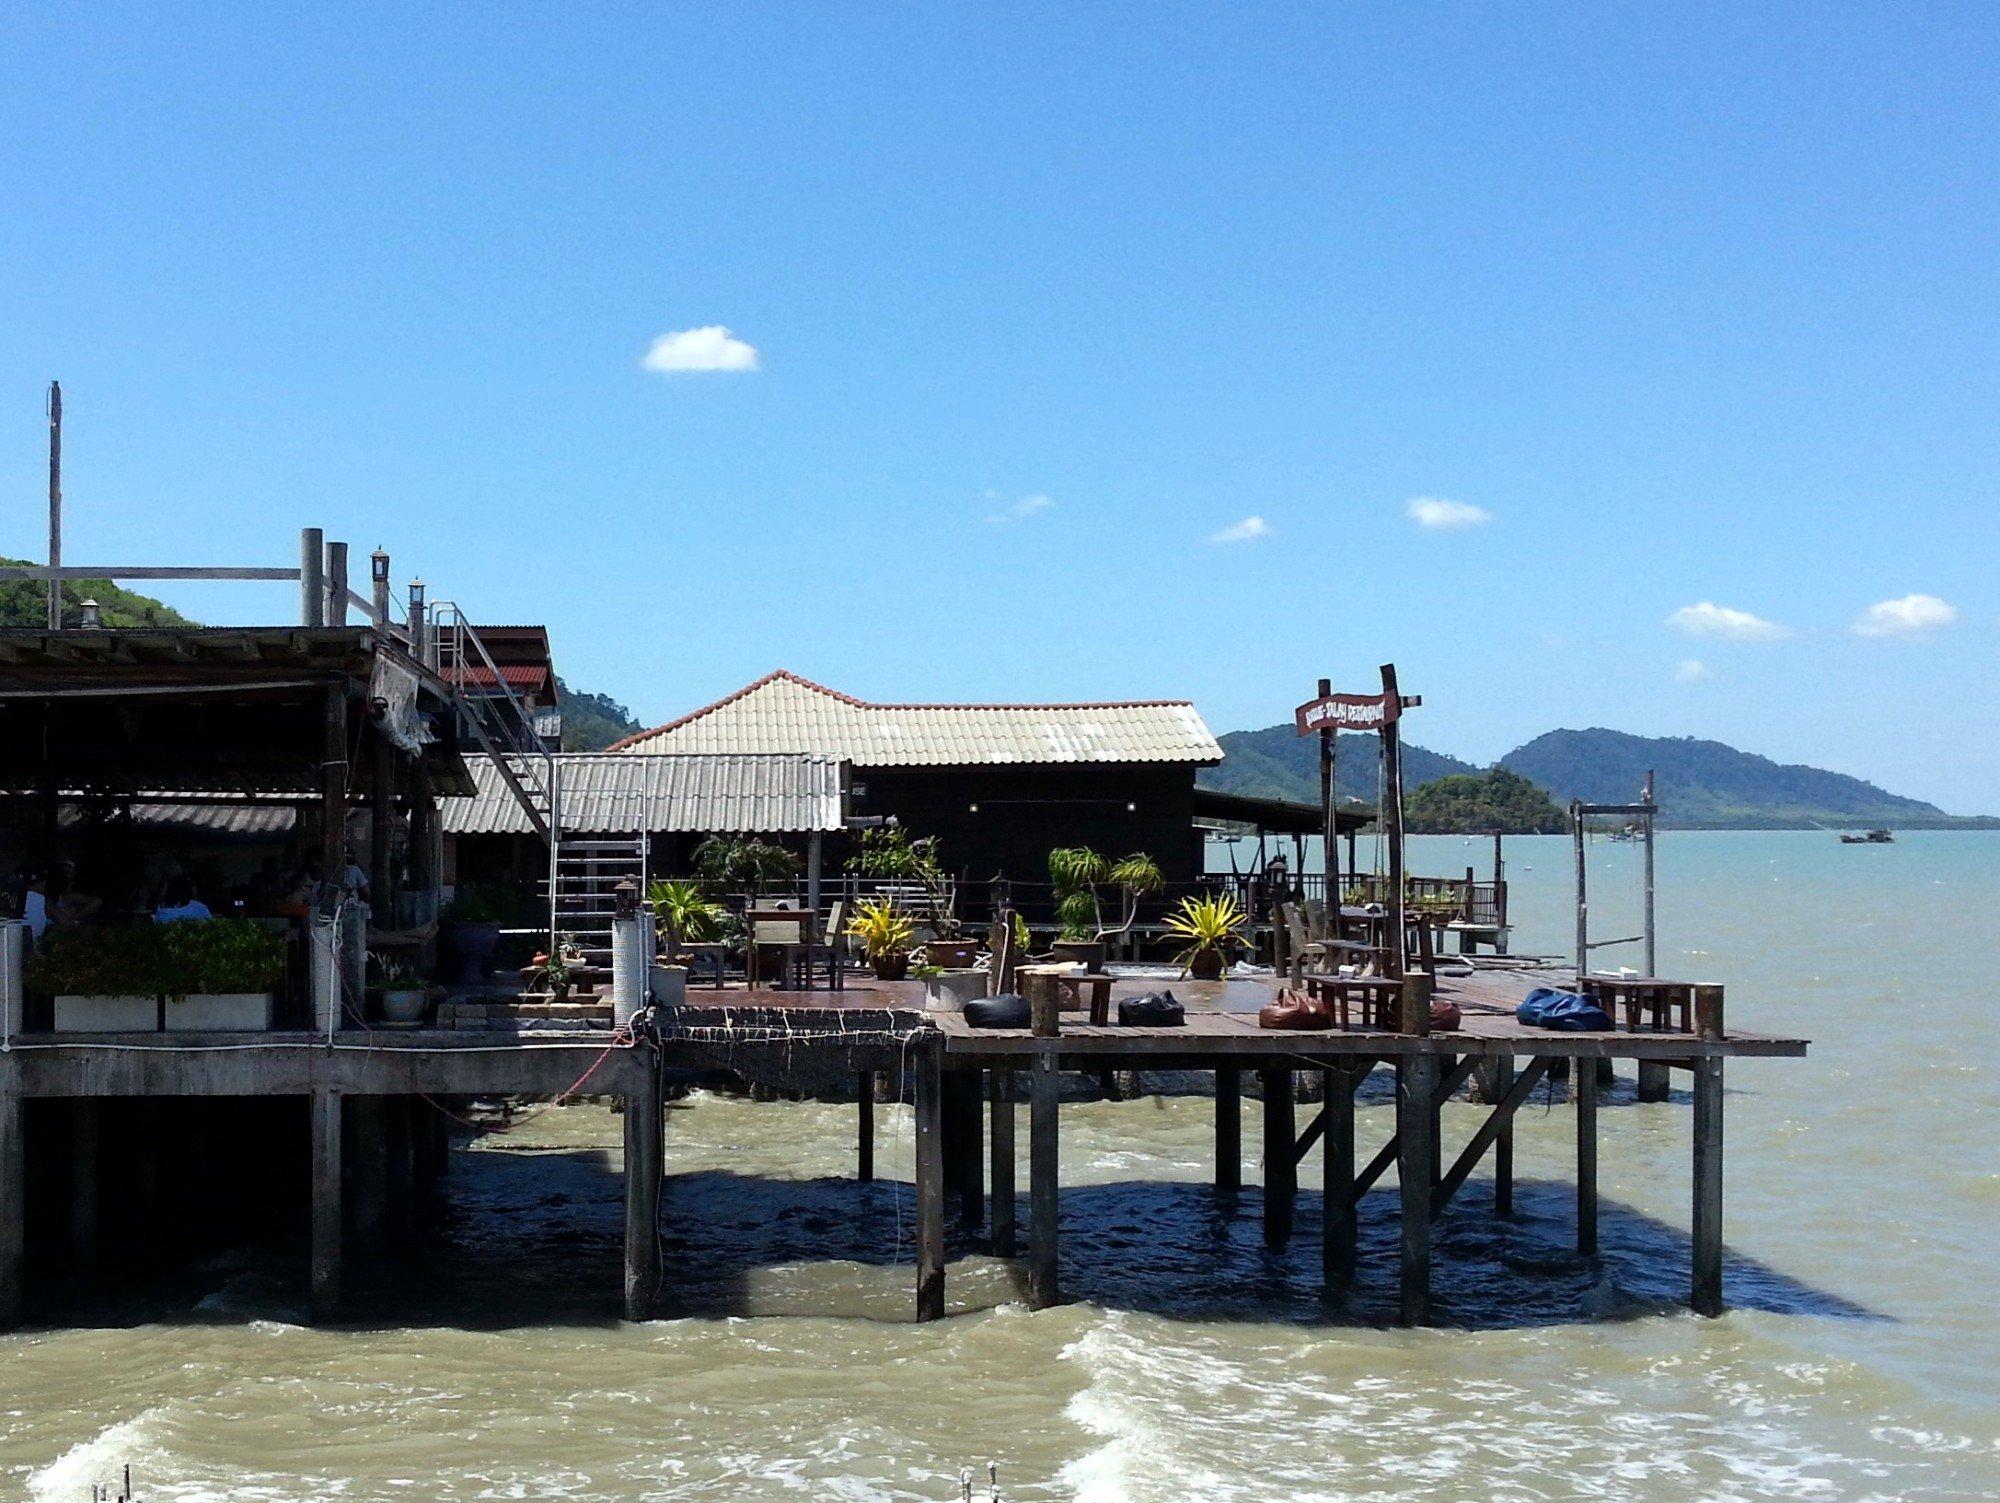 Seafront restaurant in Koh Lanta Old Town